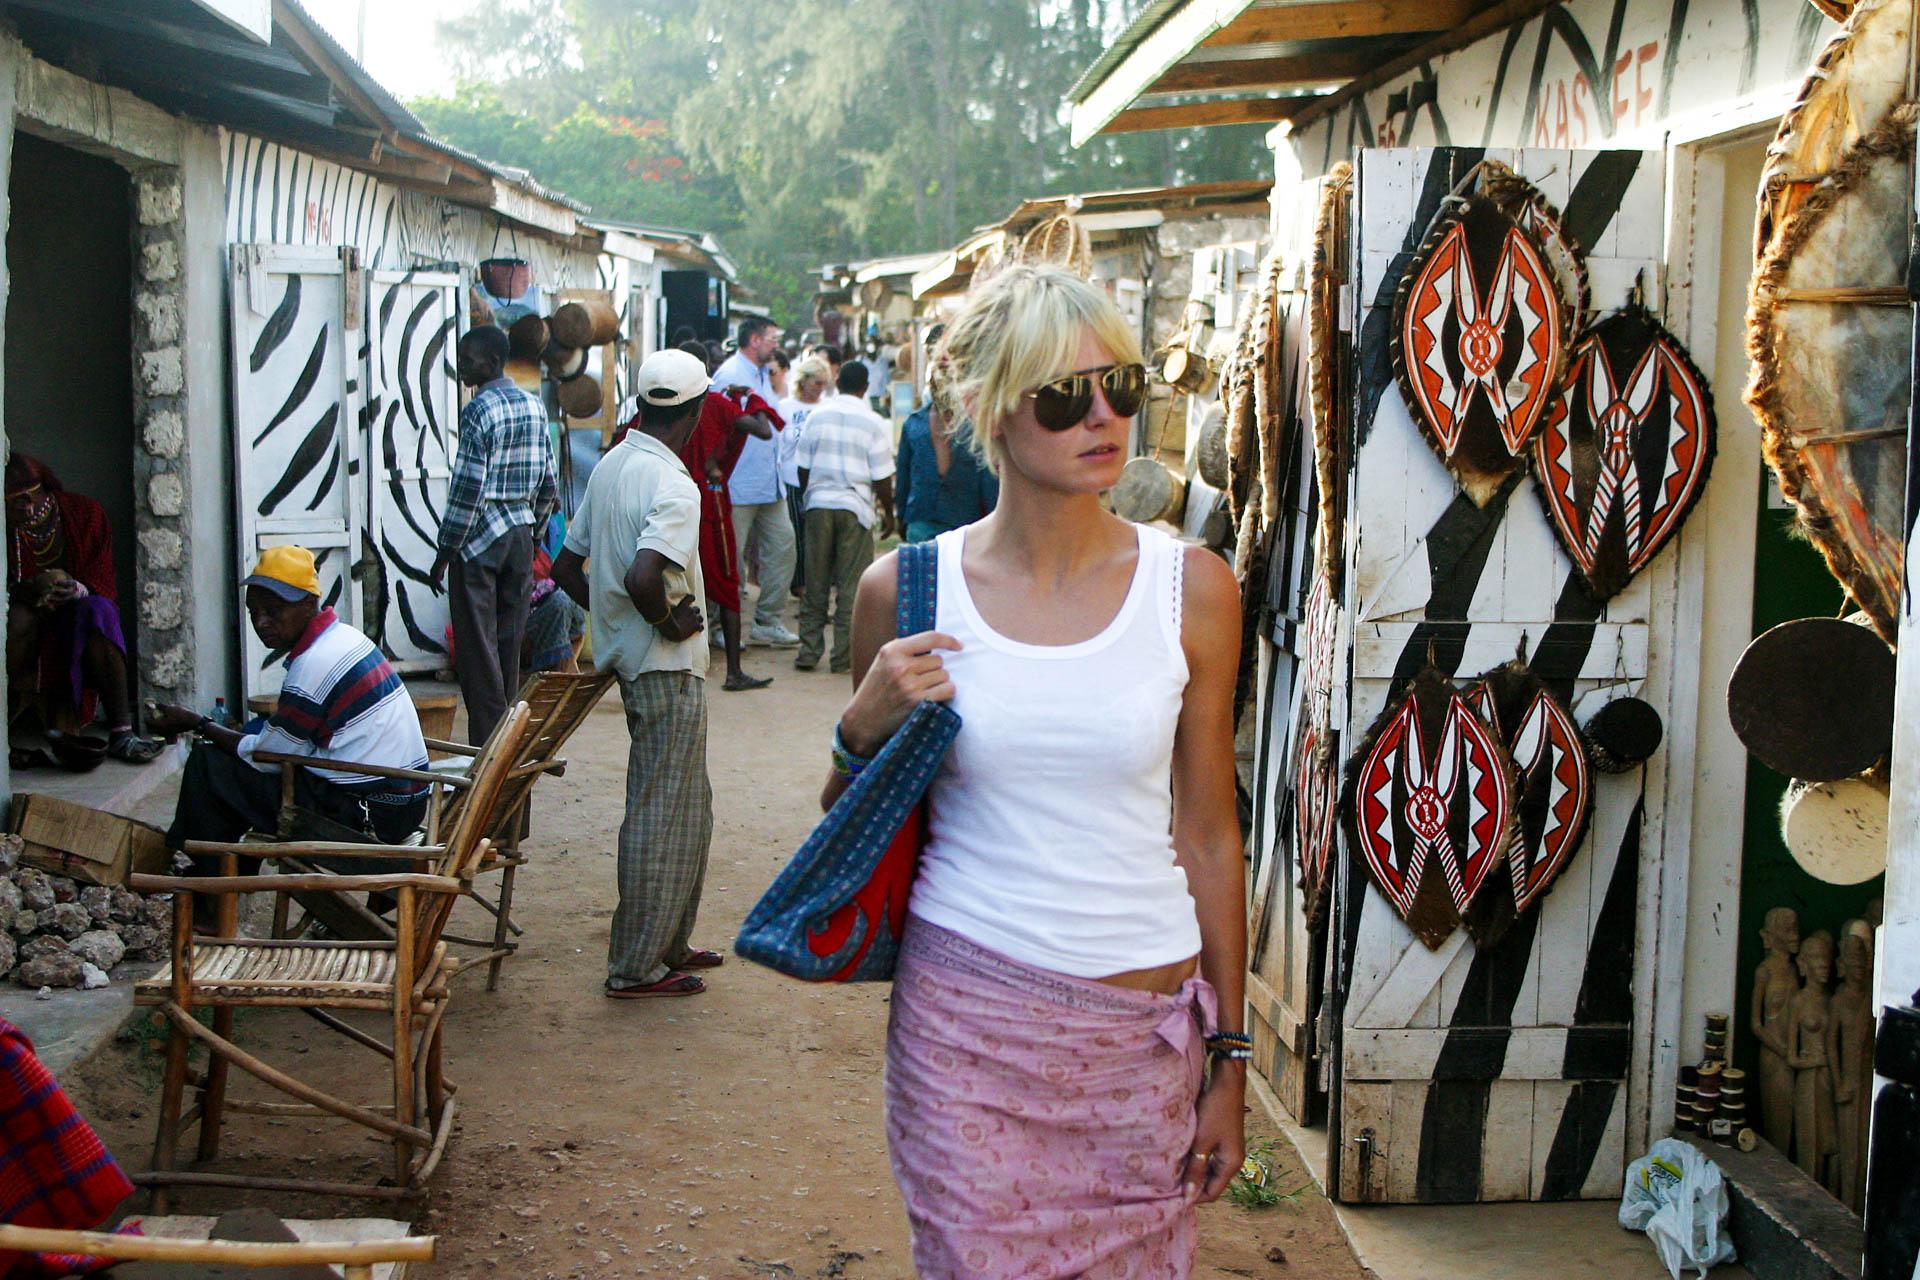 Shopping in the market of Malindi.